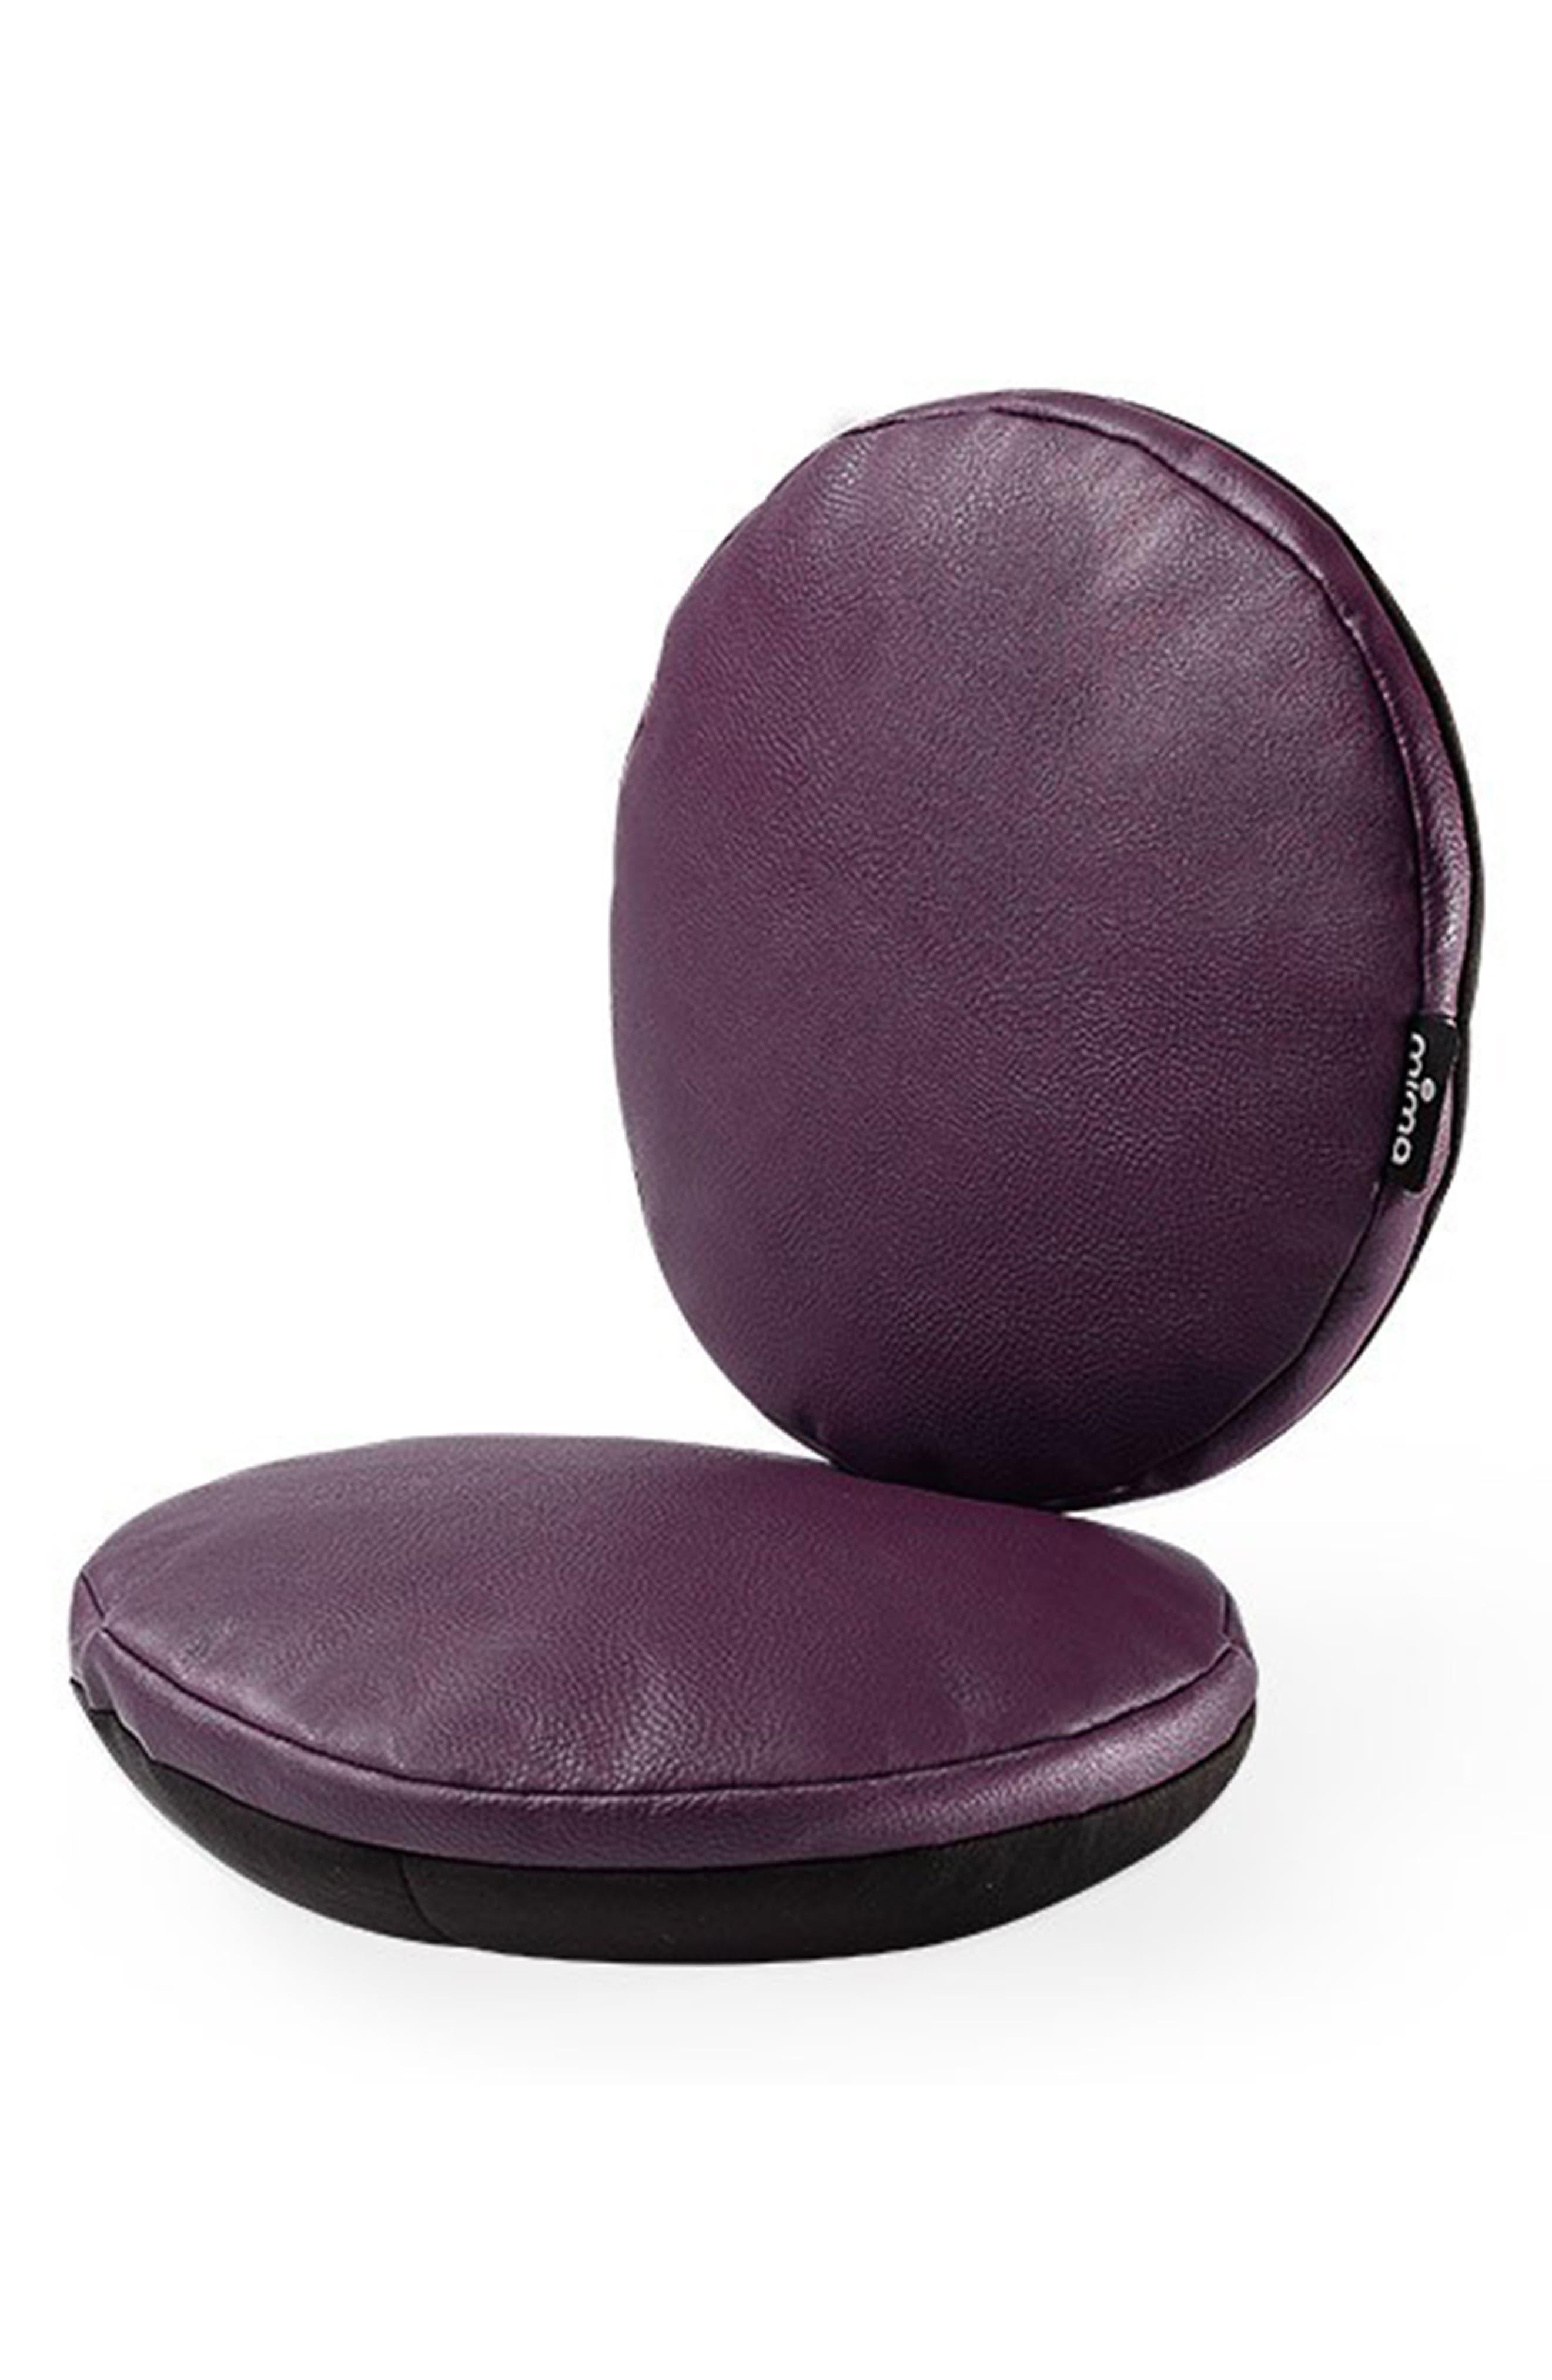 Moon Junior Highchair Seat Cushion,                         Main,                         color, AUBERGINE